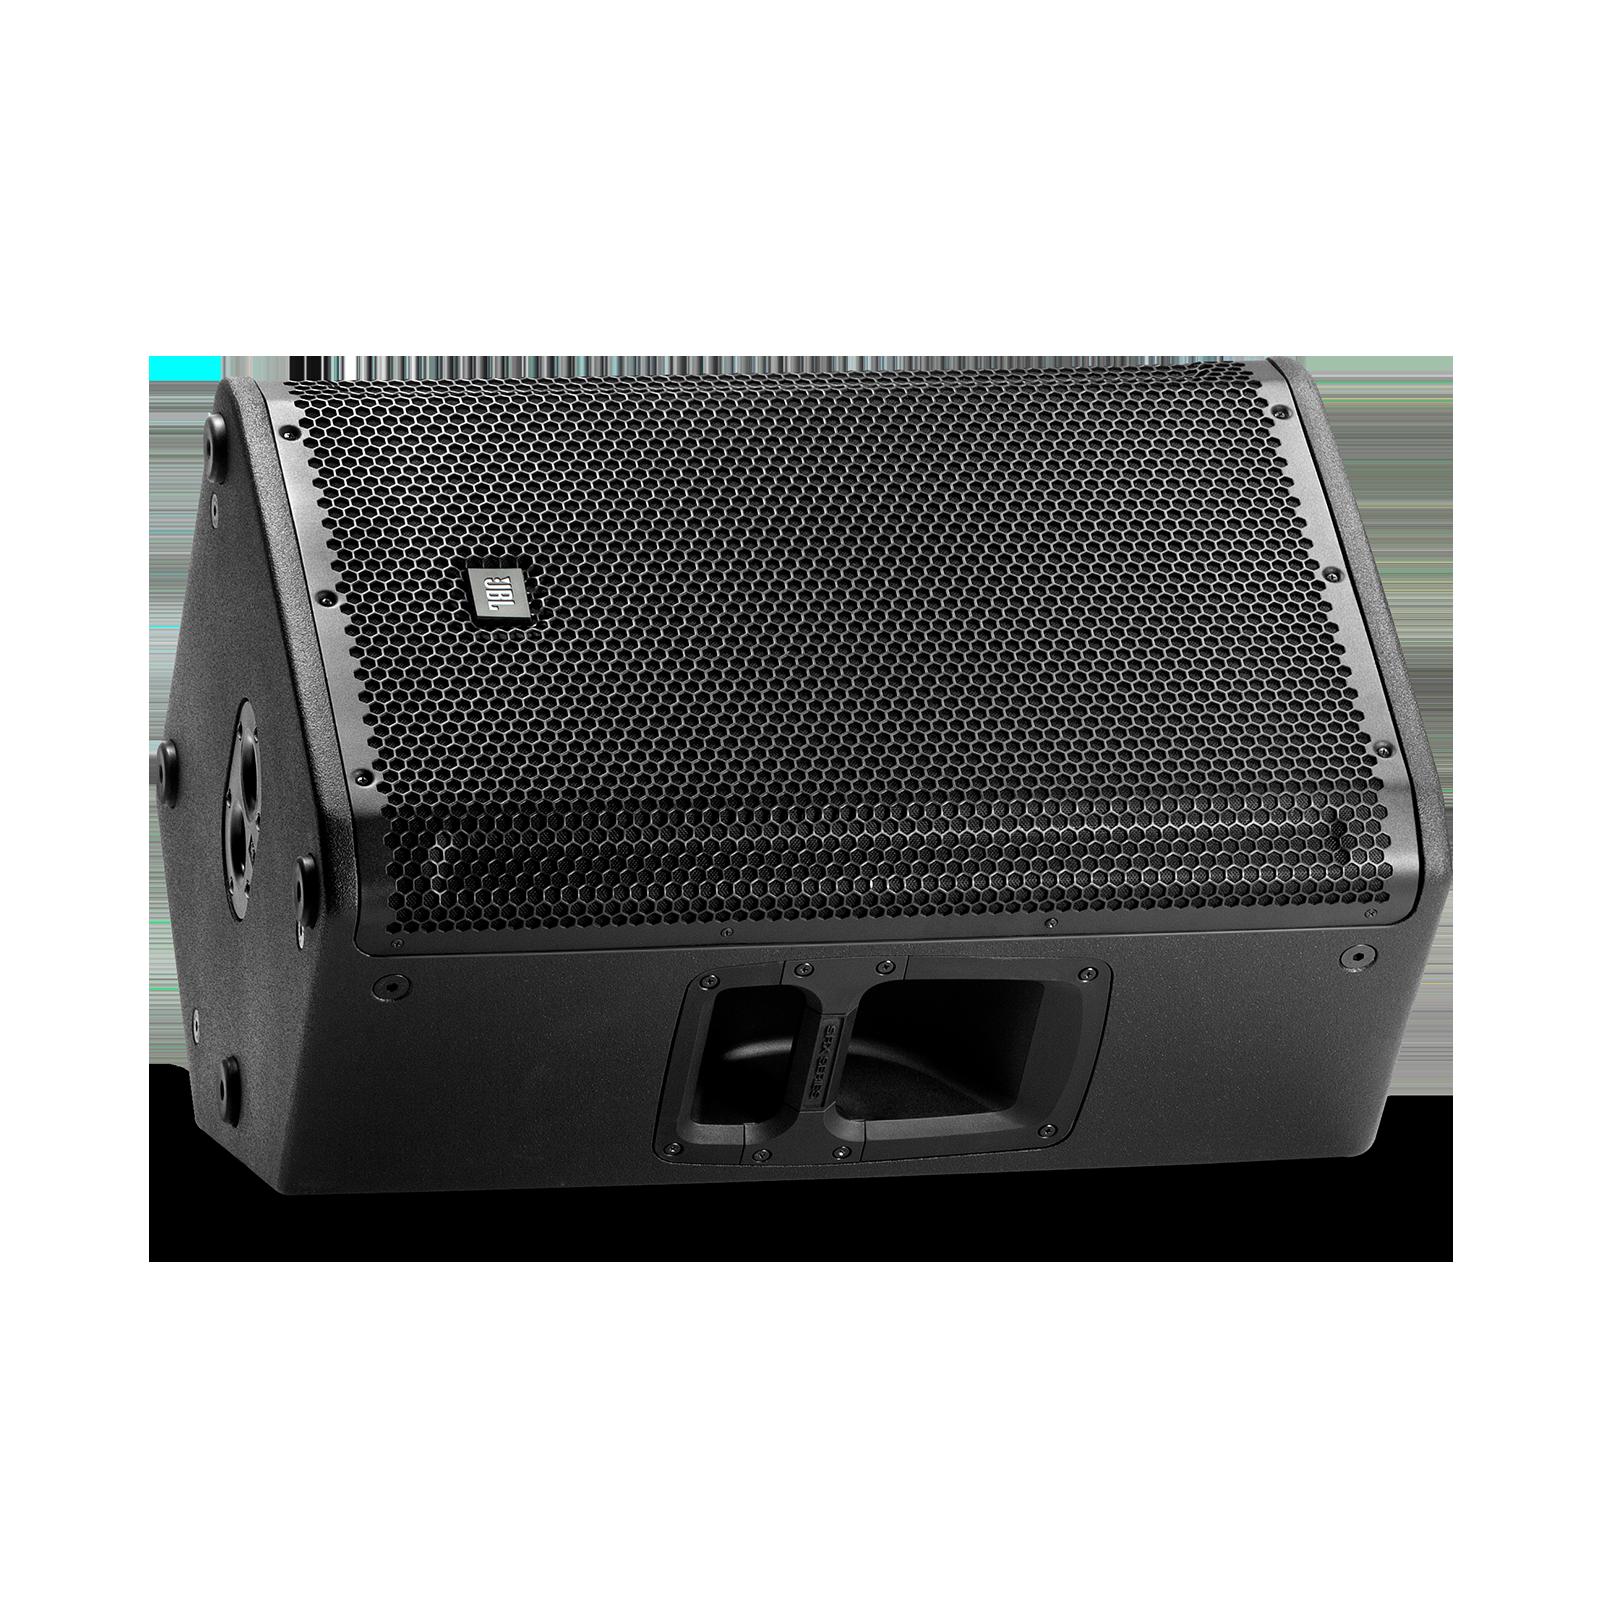 "JBL SRX812 - Black - 12"" Two-Way Bass Reflex Passive System - Detailshot 2"